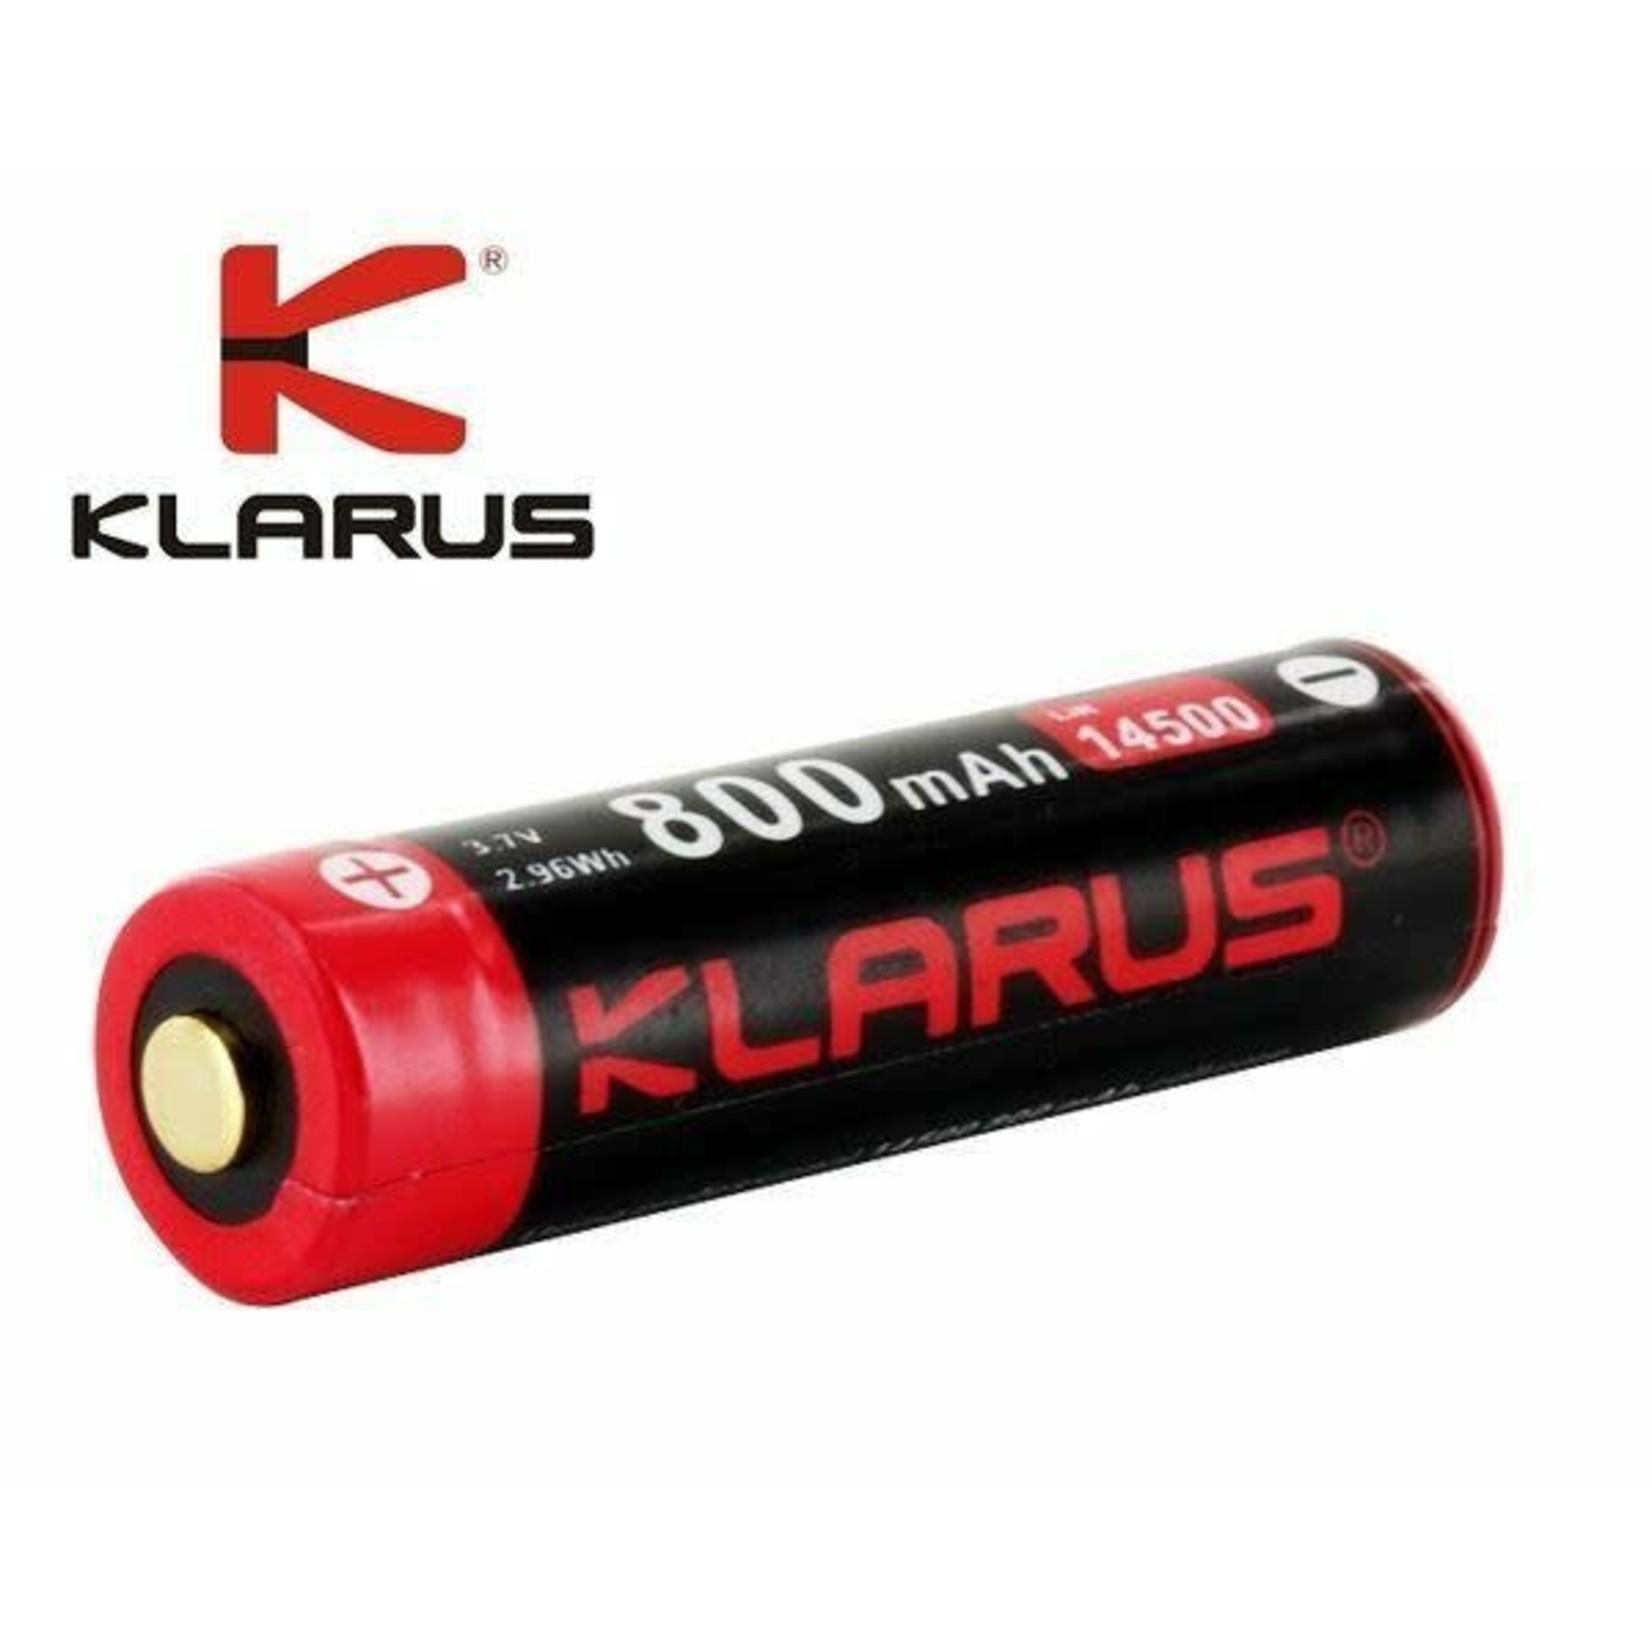 Klarus Klarus 800 mAh Rechargeable Battery